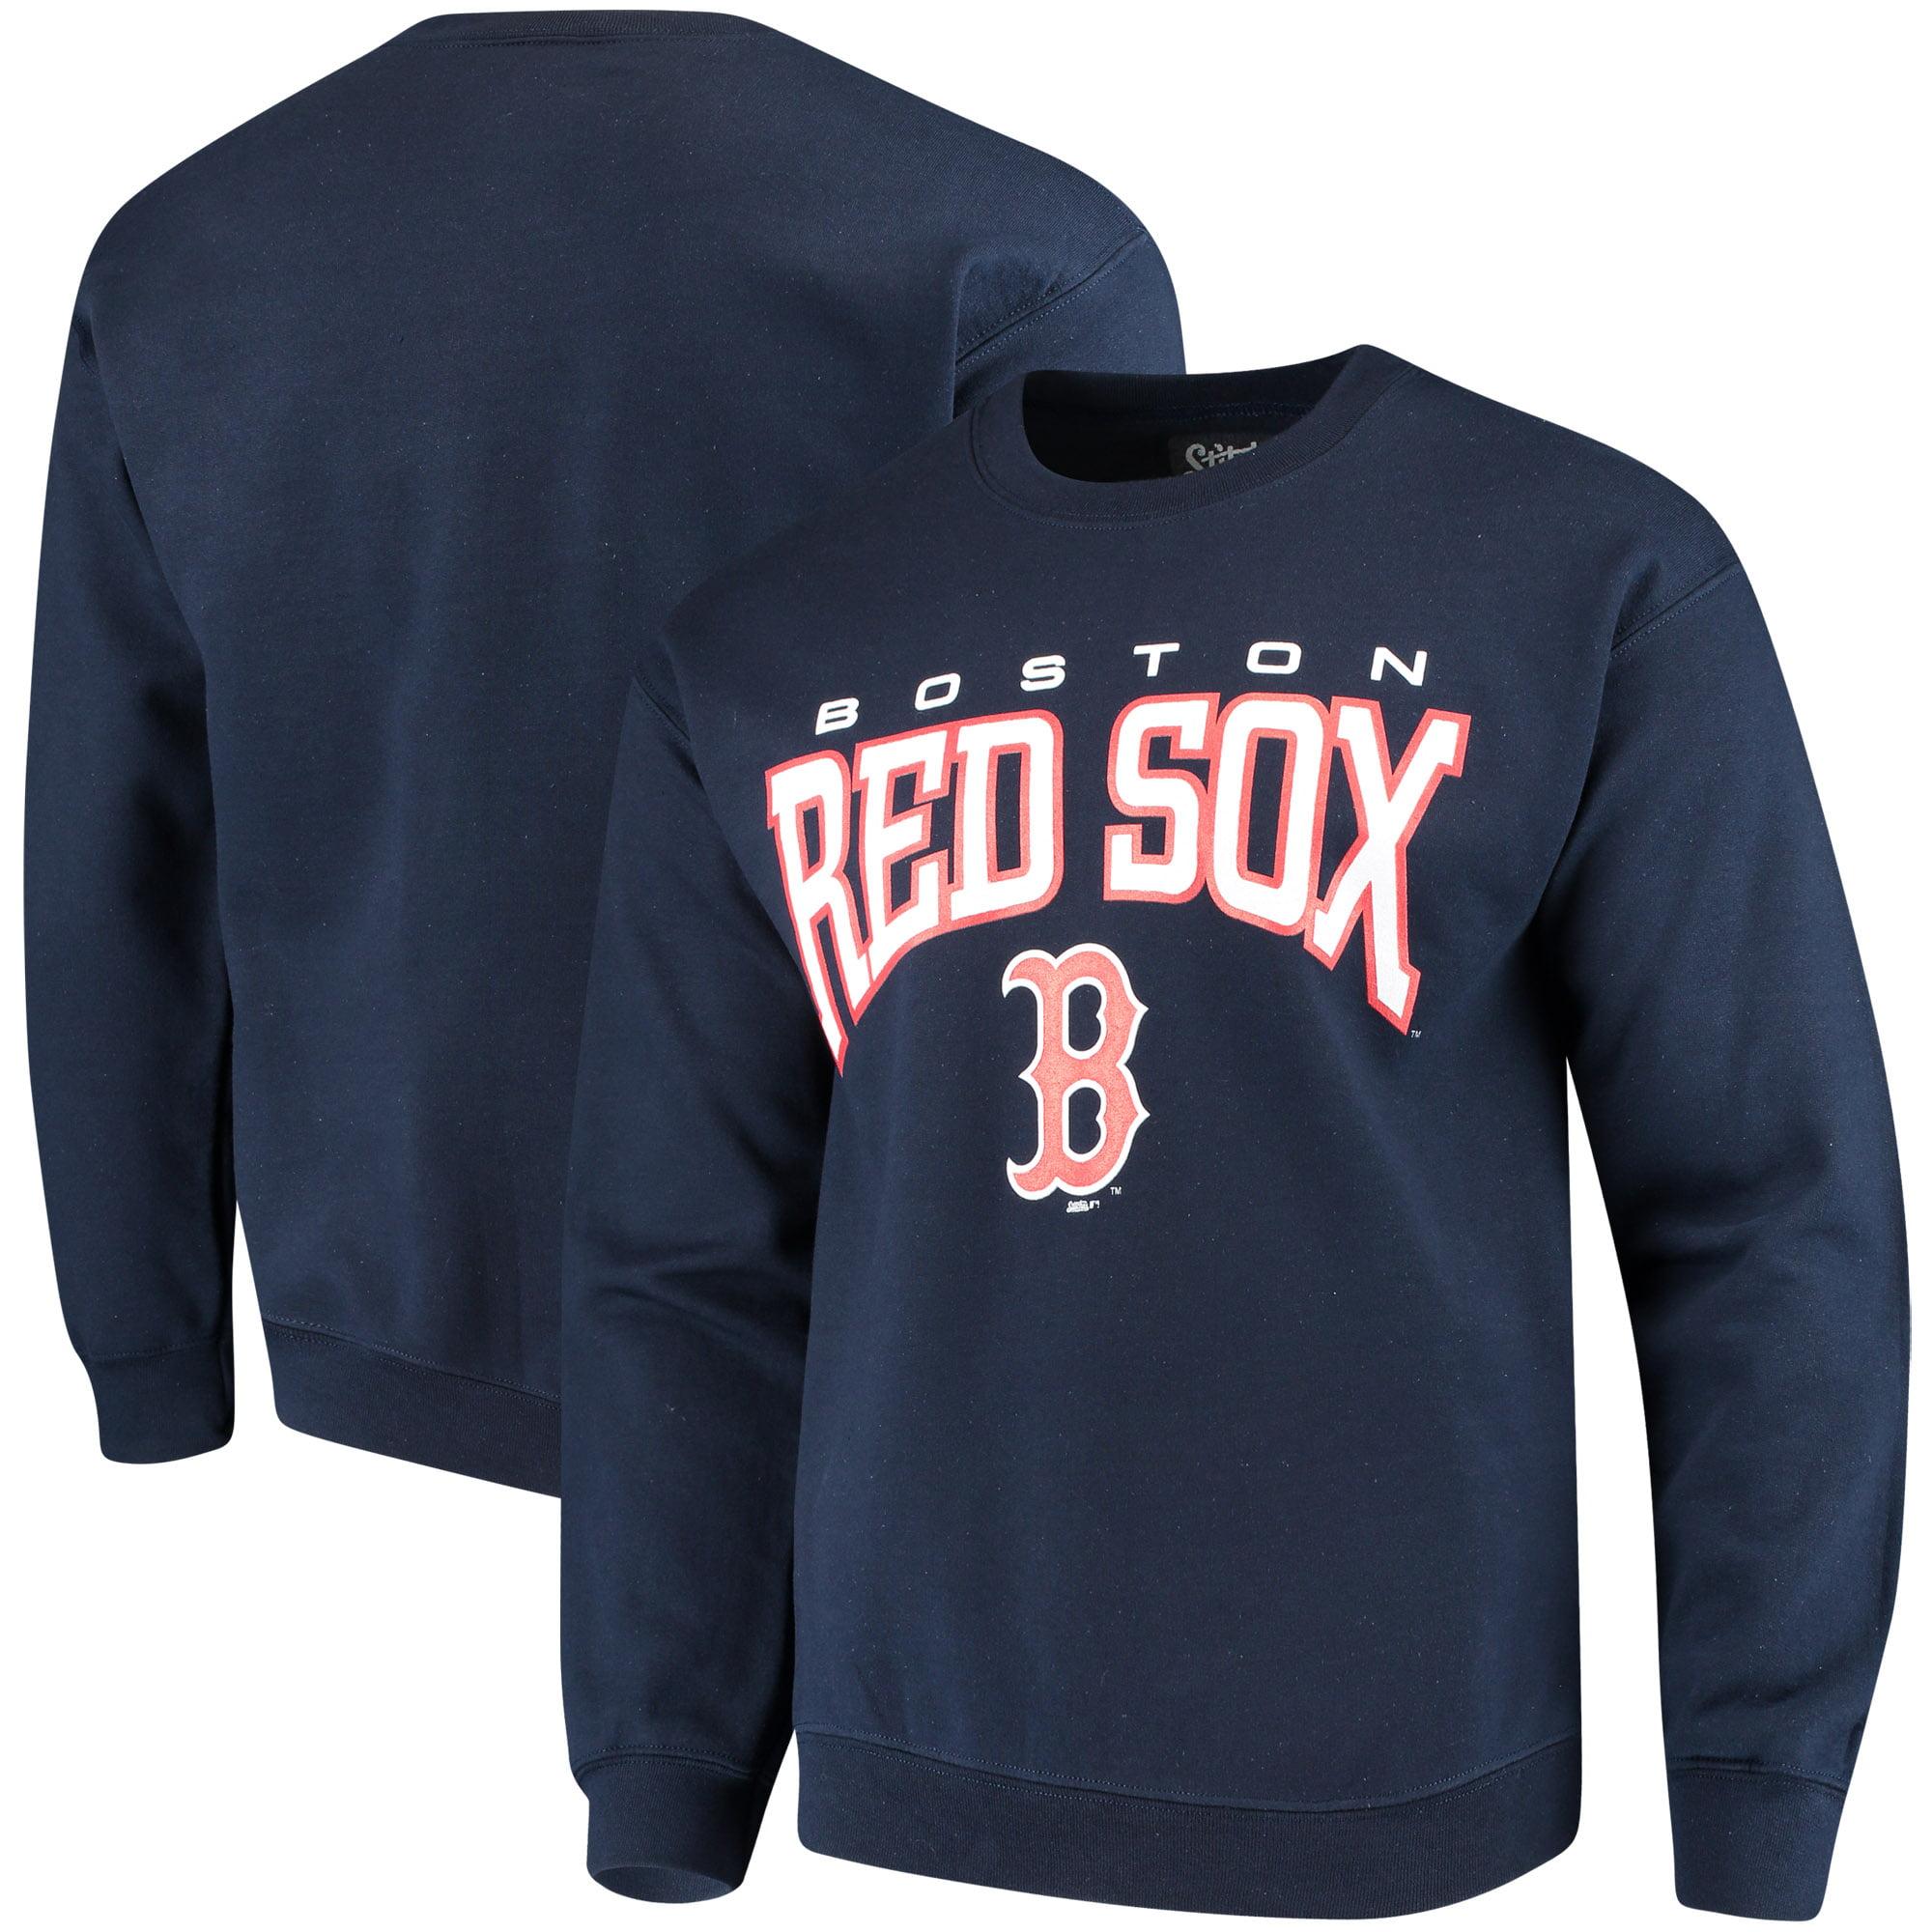 Boston Red Sox Stitches Pullover Crew Sweatshirt - Navy